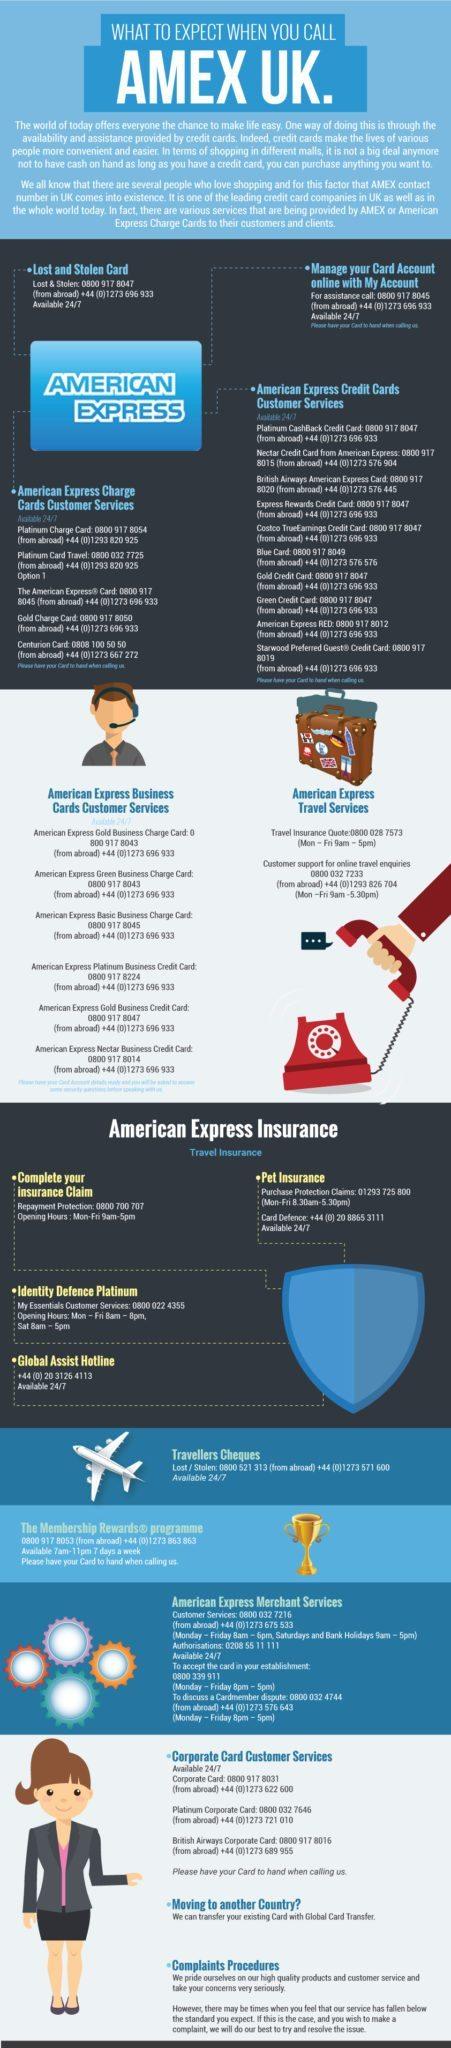 AMEX Phone Numbers